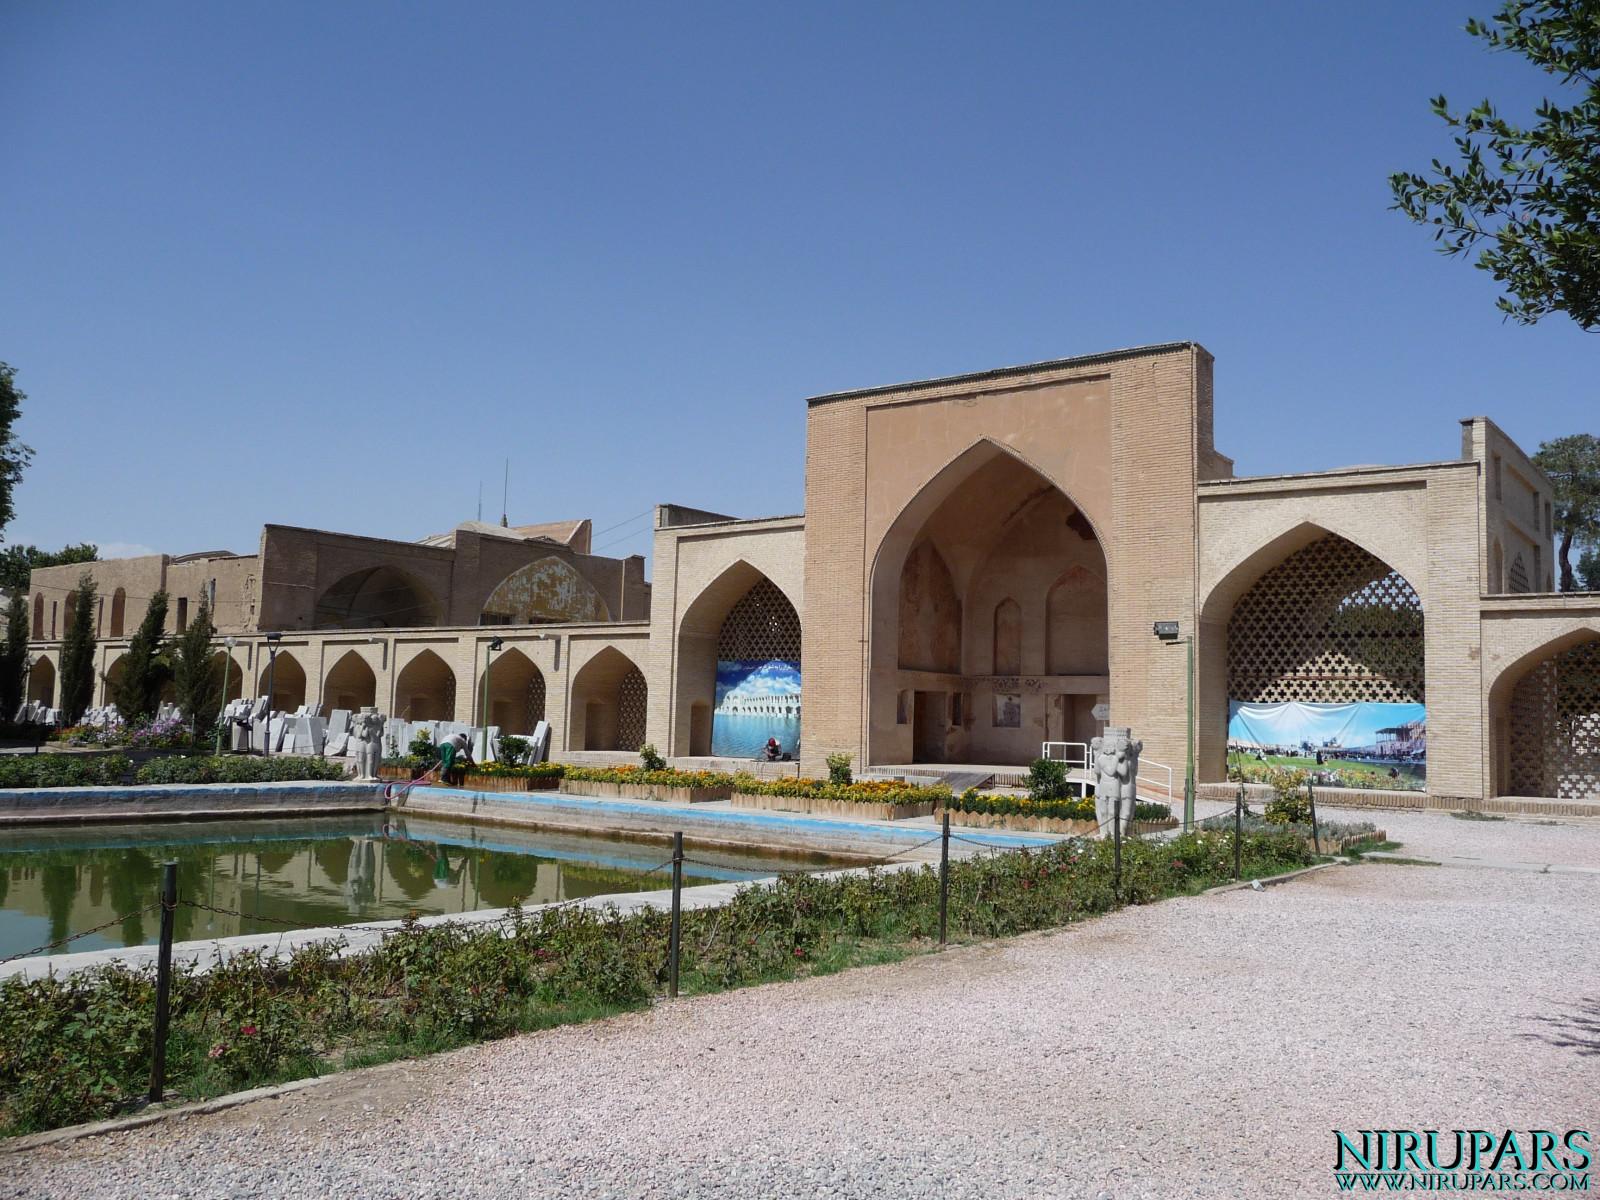 Chehel Sotun - Entrance Gate